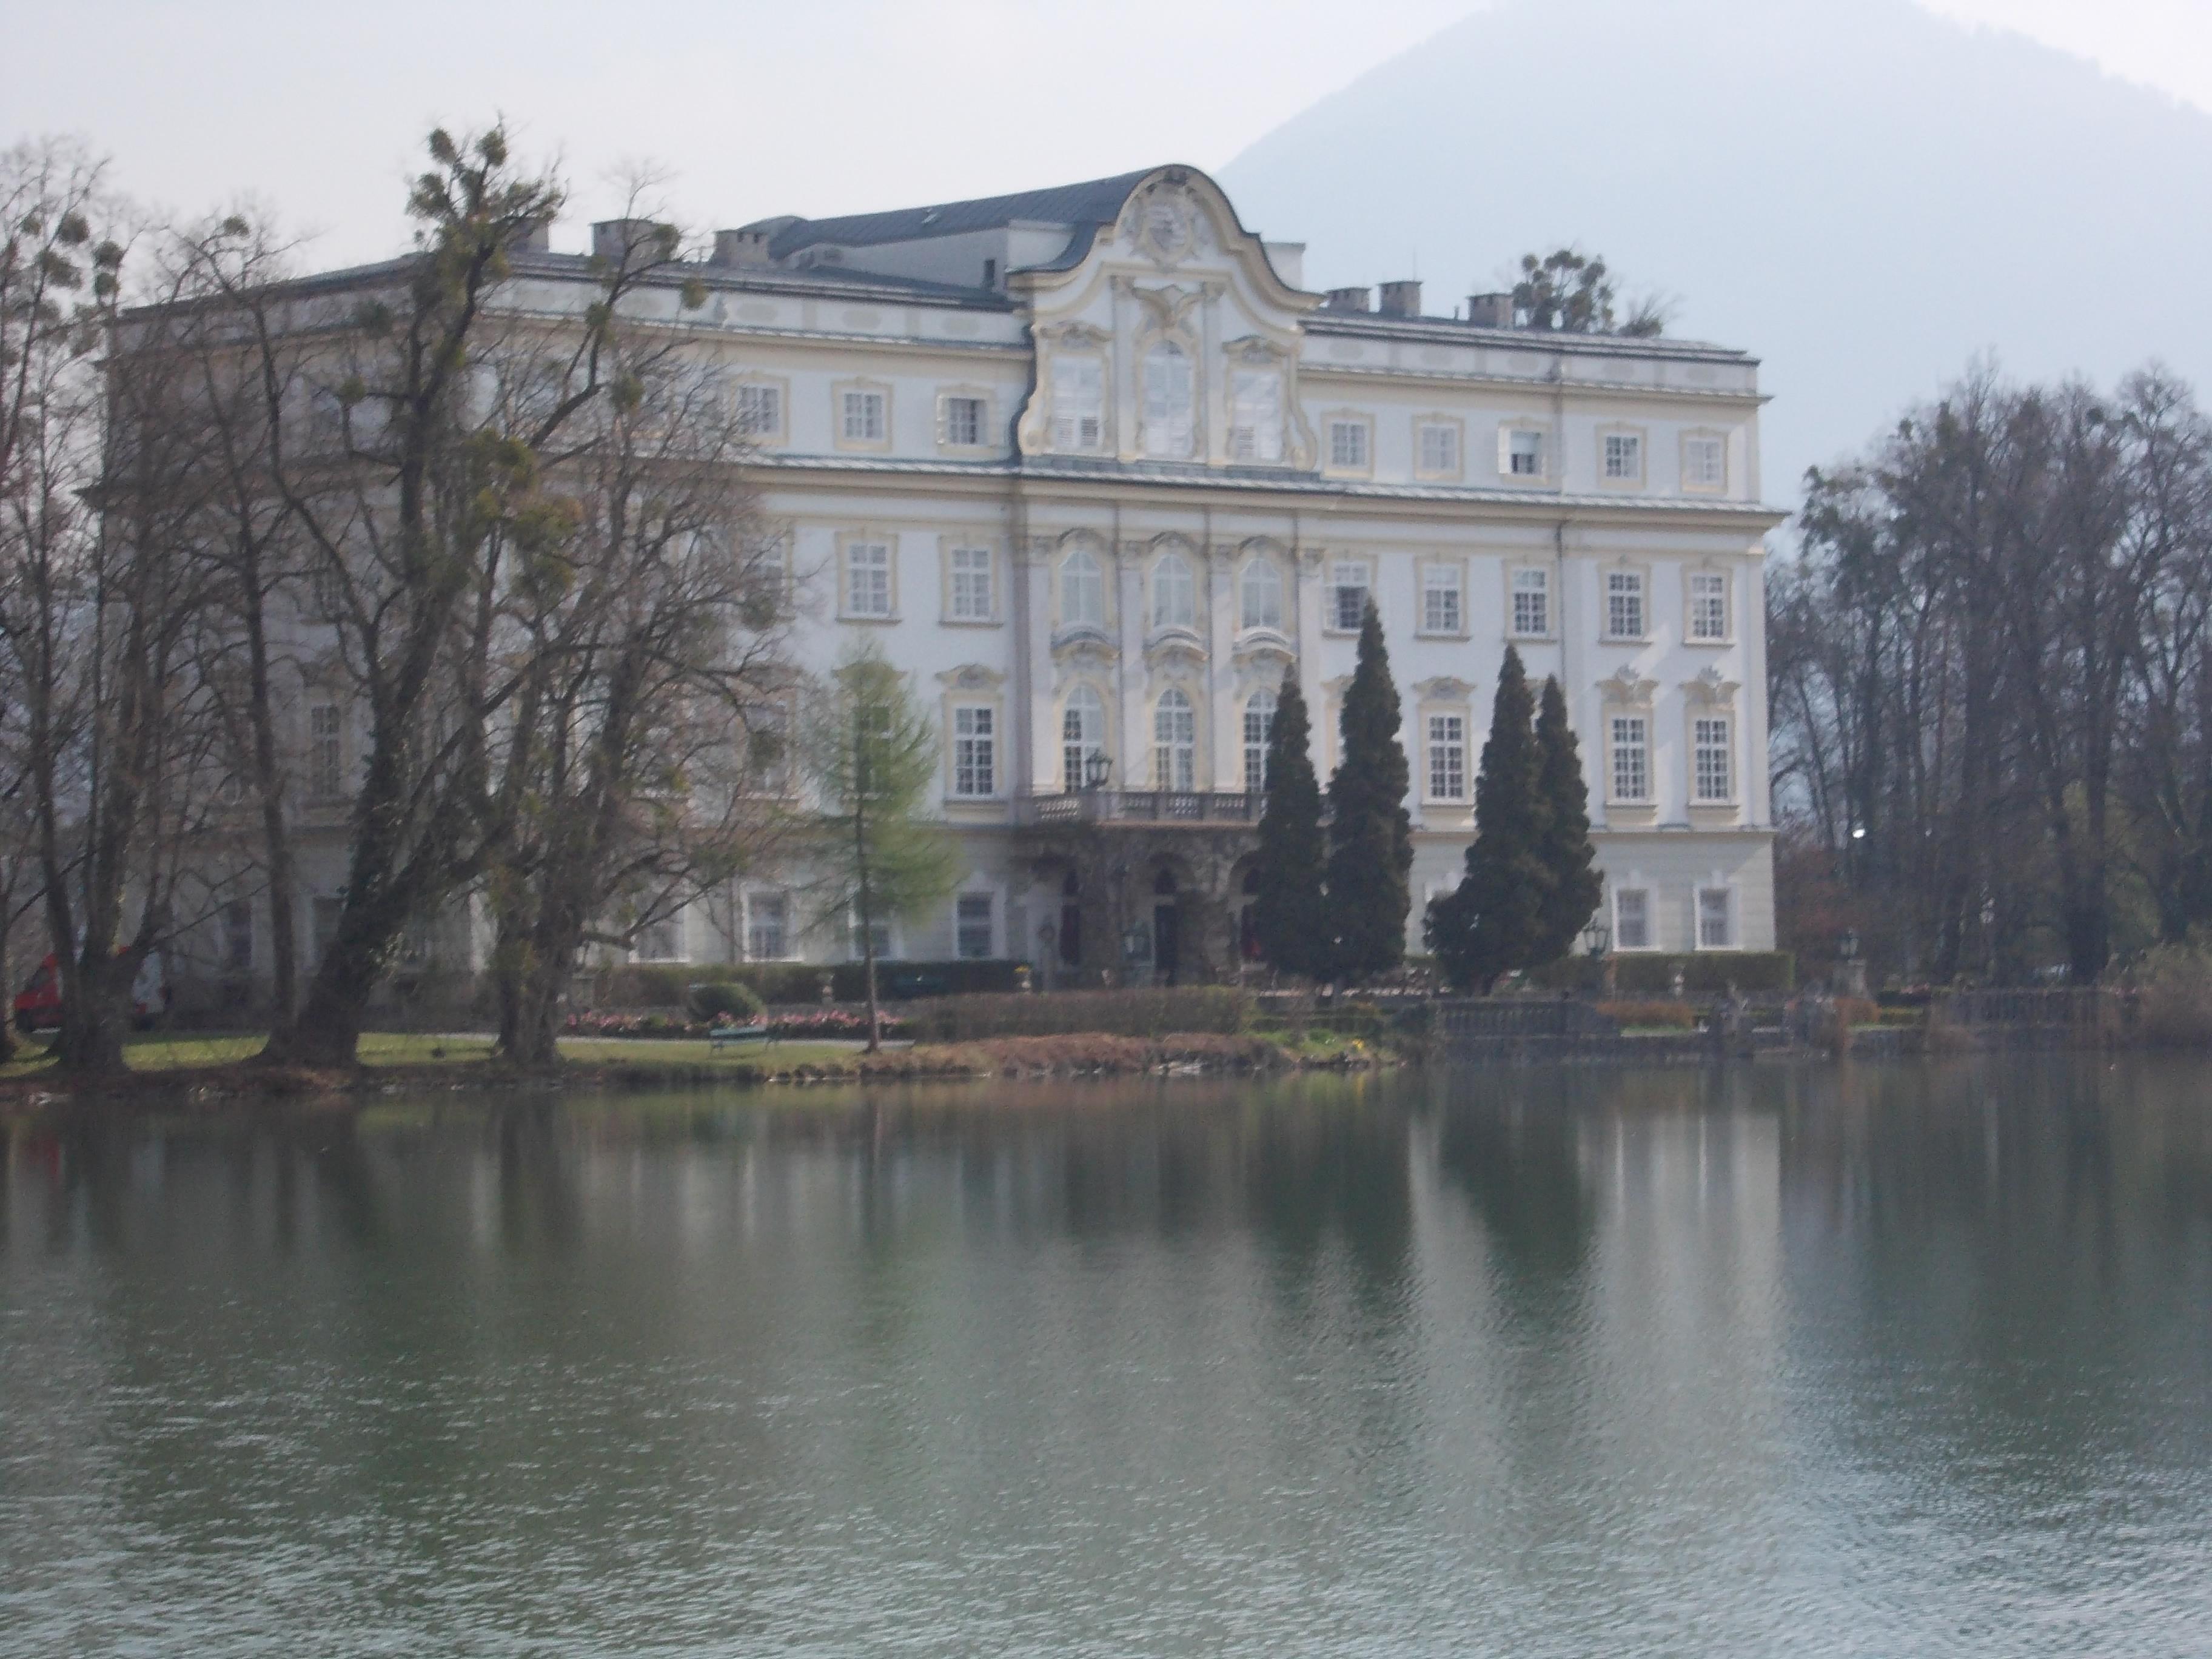 Semana santa series part 9 salzburg sound of music tour for Whats house music